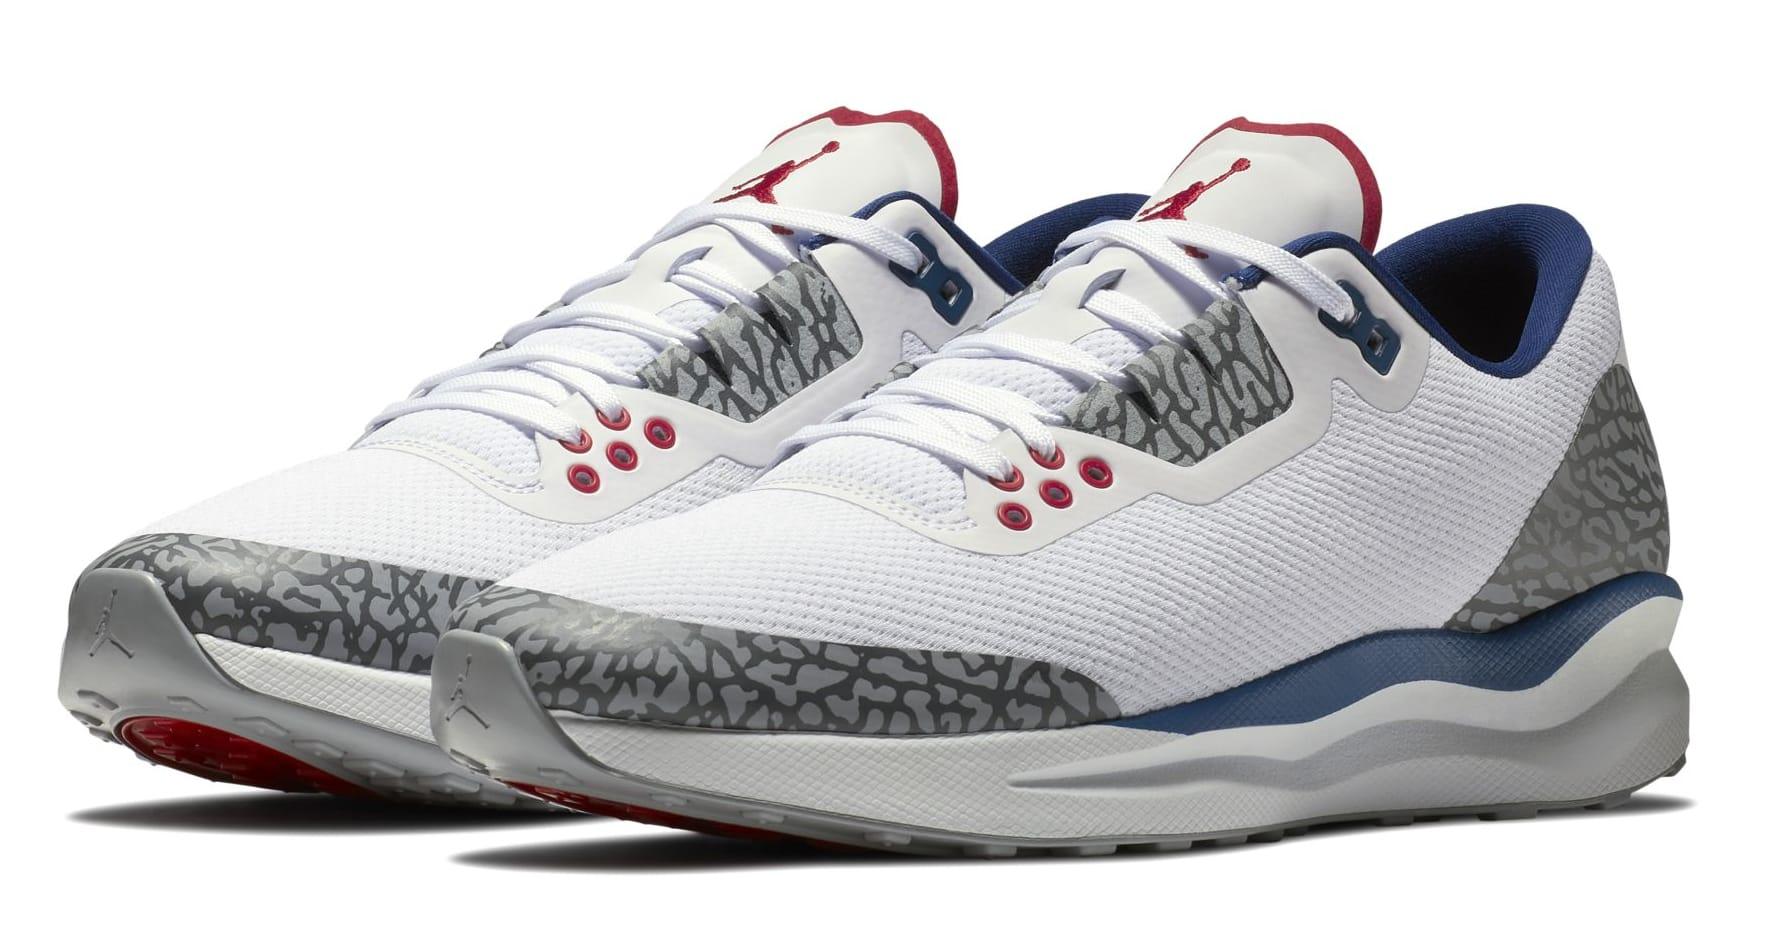 Nike Air Jordan Zoom Tenacity 88 White/True Blue Cement Mens Retro Running NEW